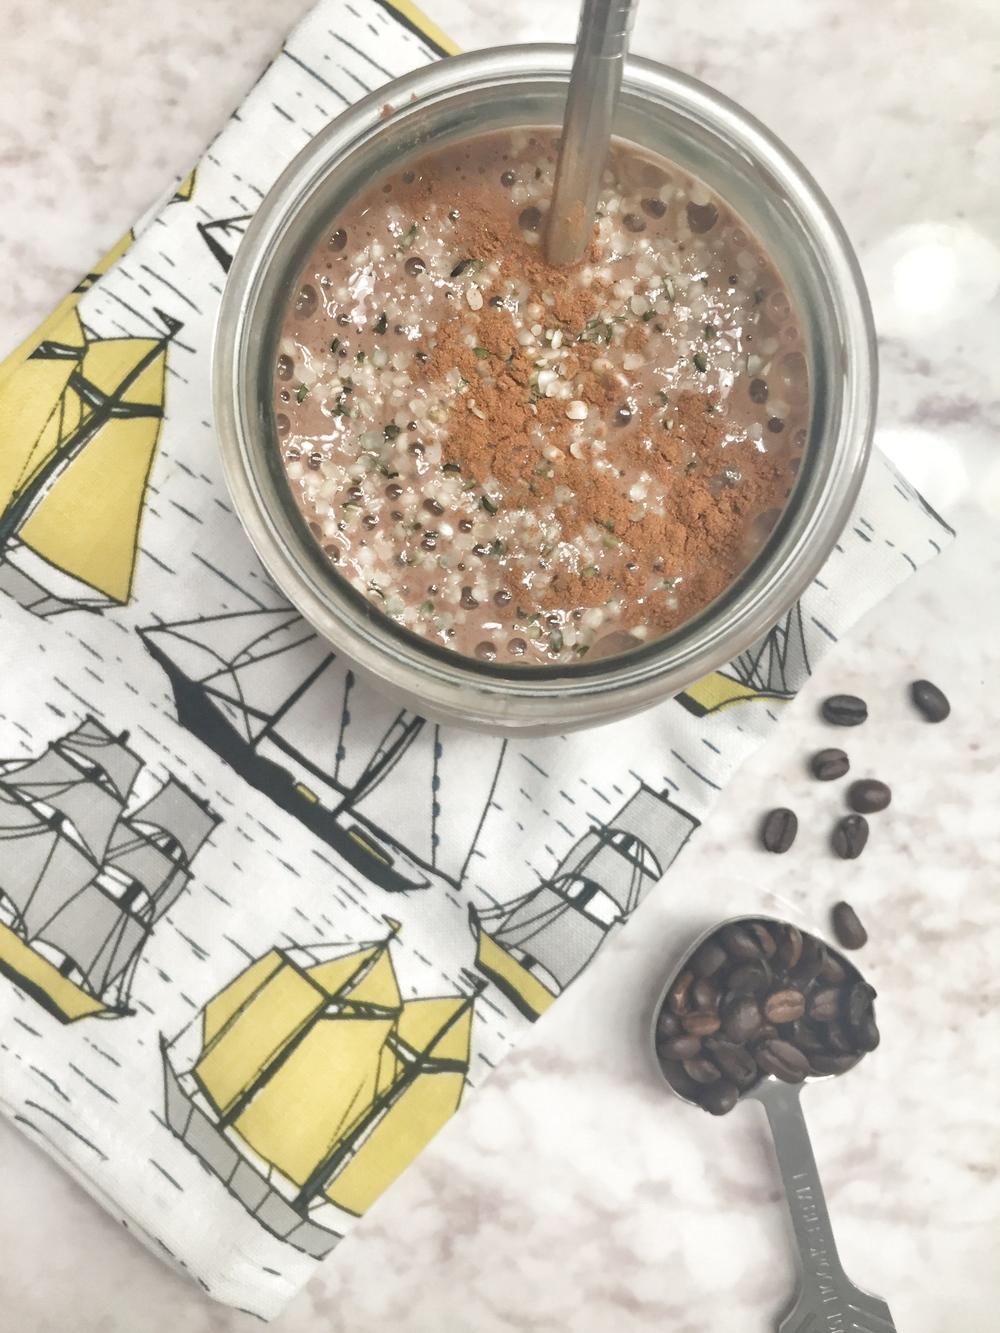 Chocolate espresso grass-fed whey shake with hemp seeds. Nope, still not suffering.